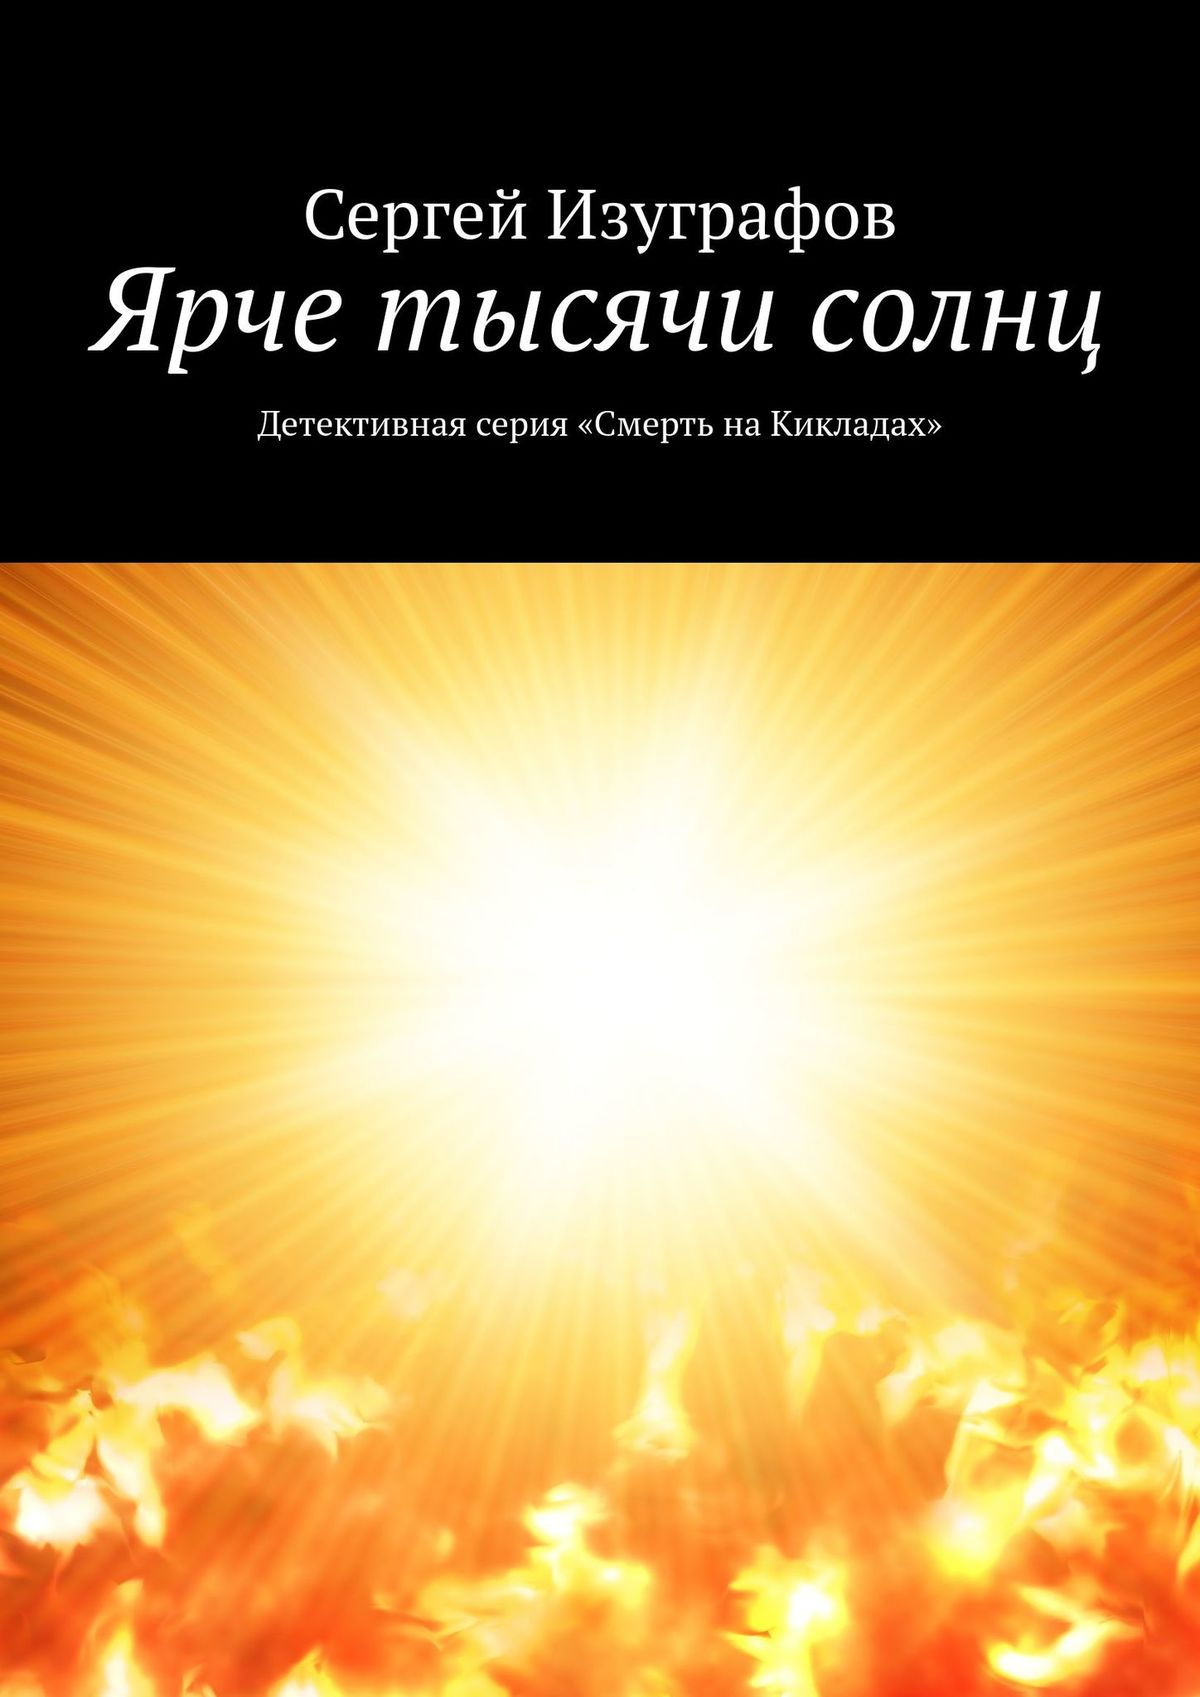 Ярче тысячи солнц